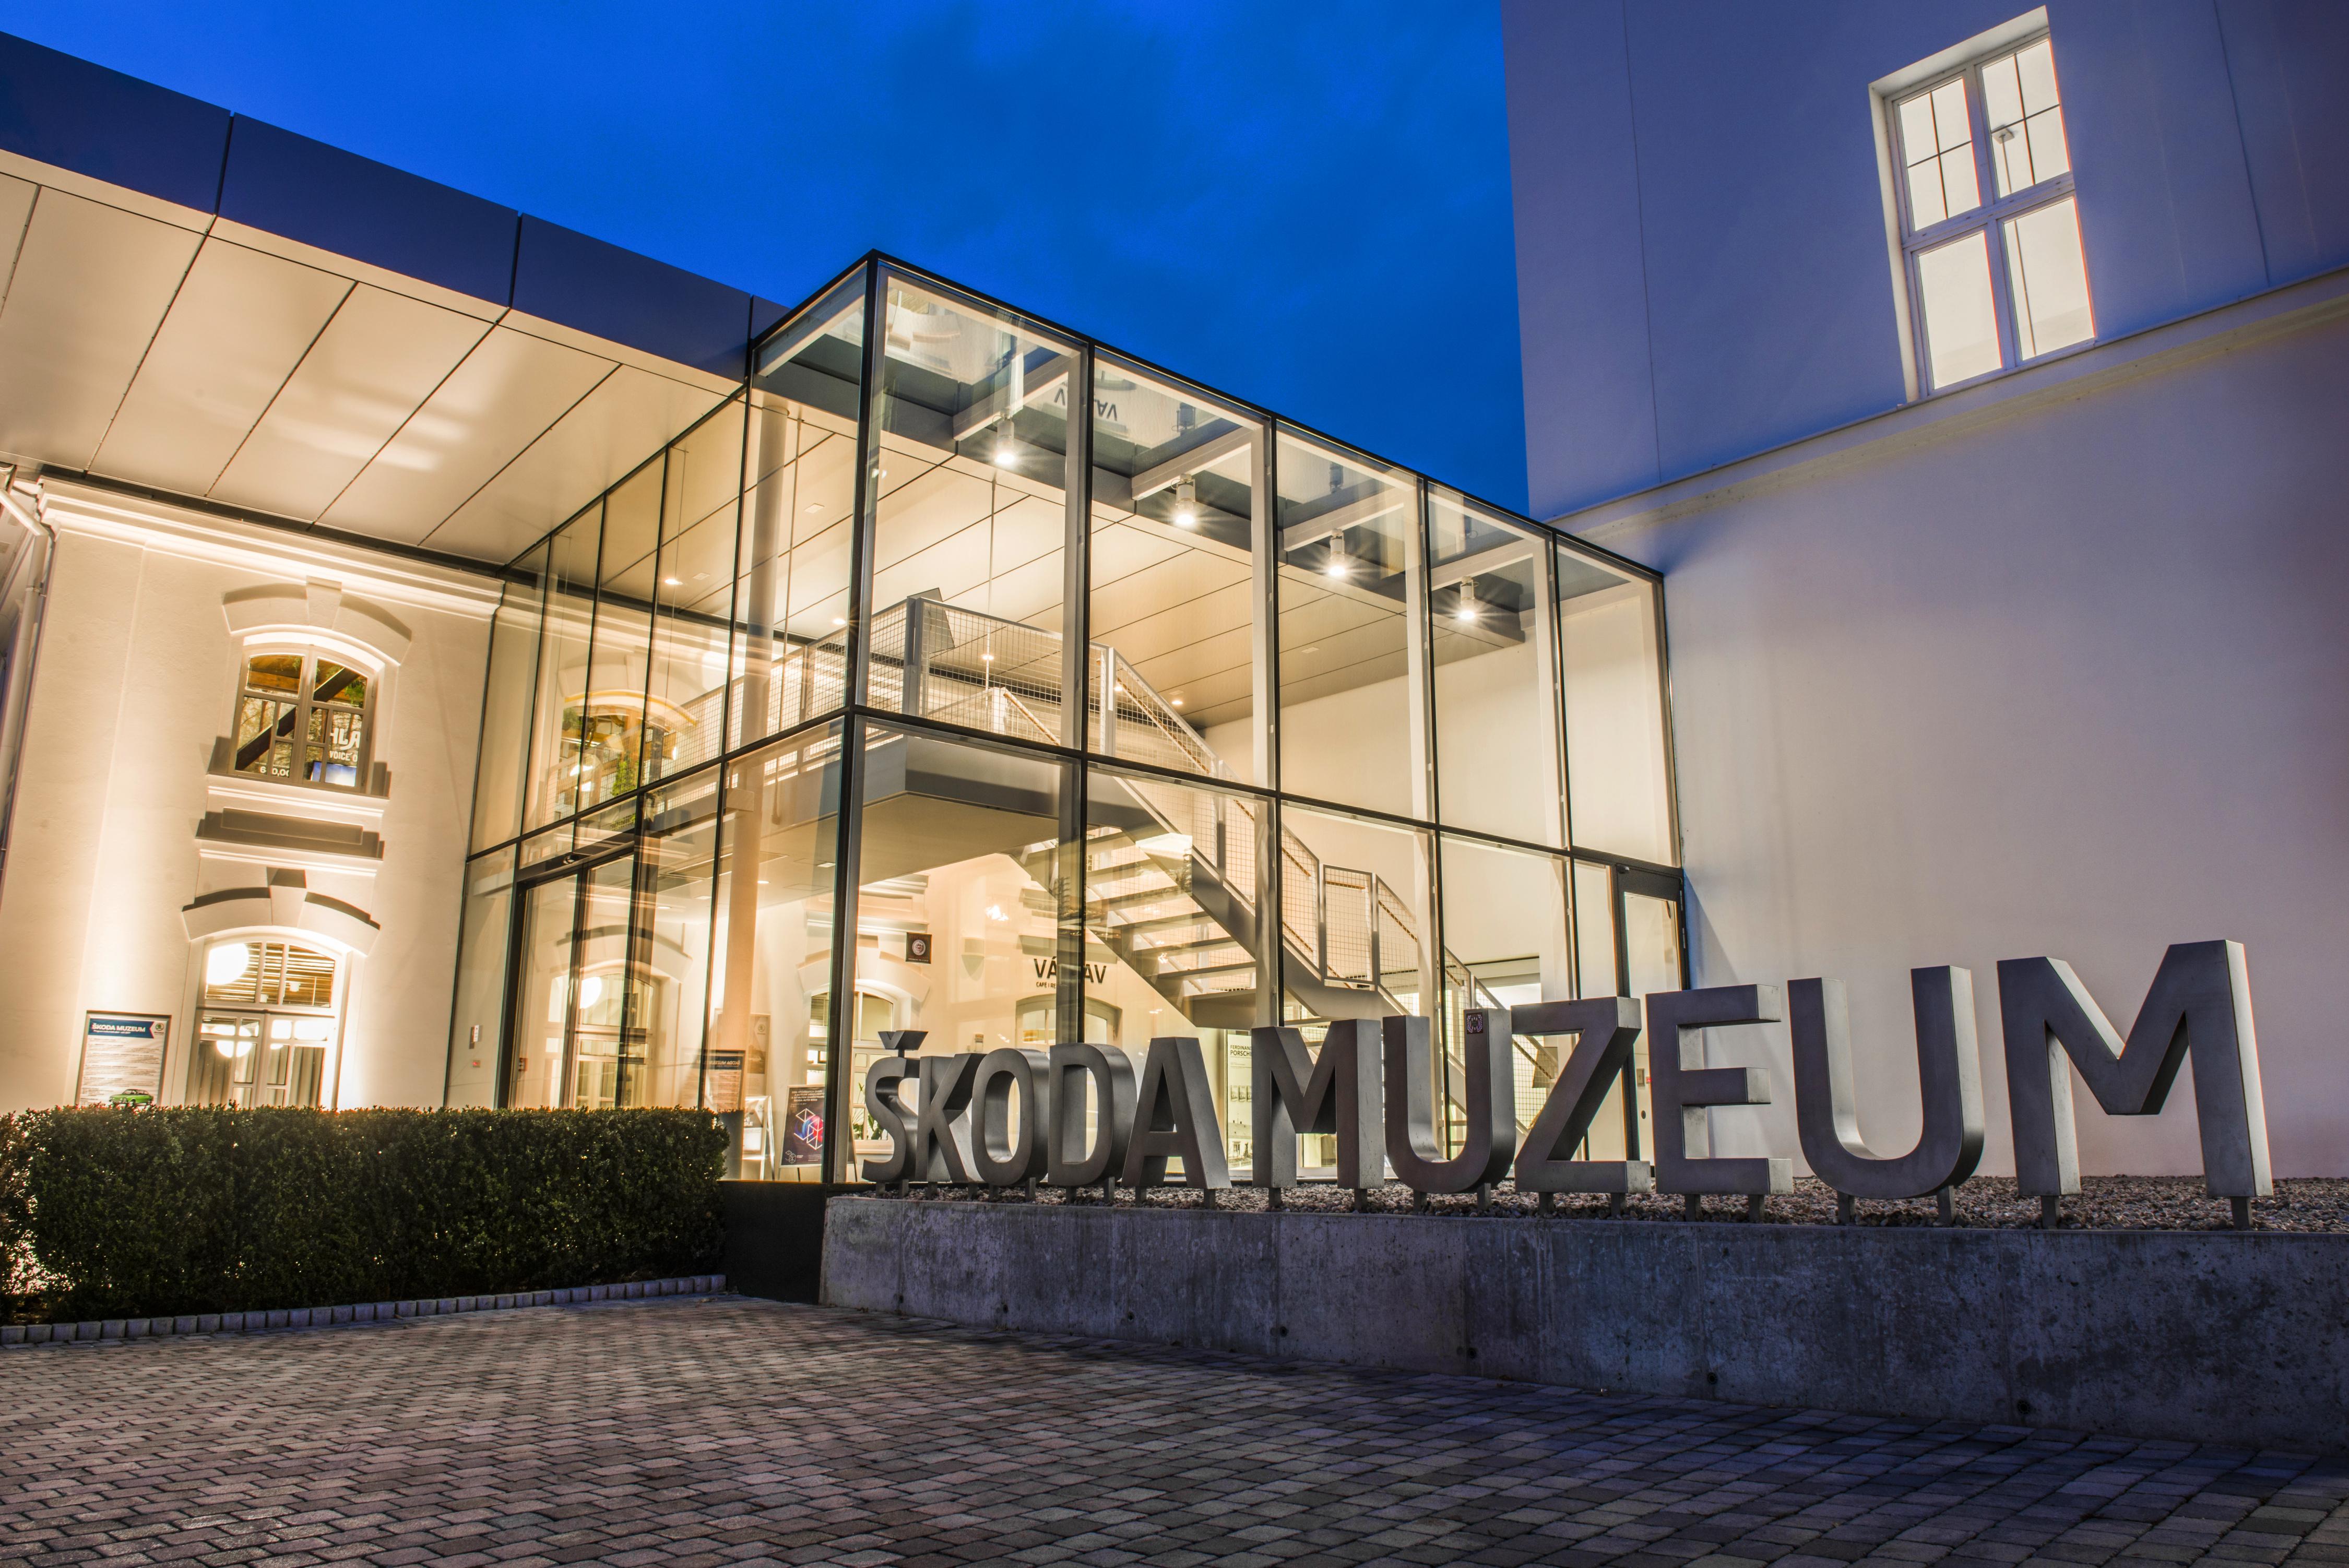 SKODA Museum and Ferdinand Porsche Birth House reopen - Image 2